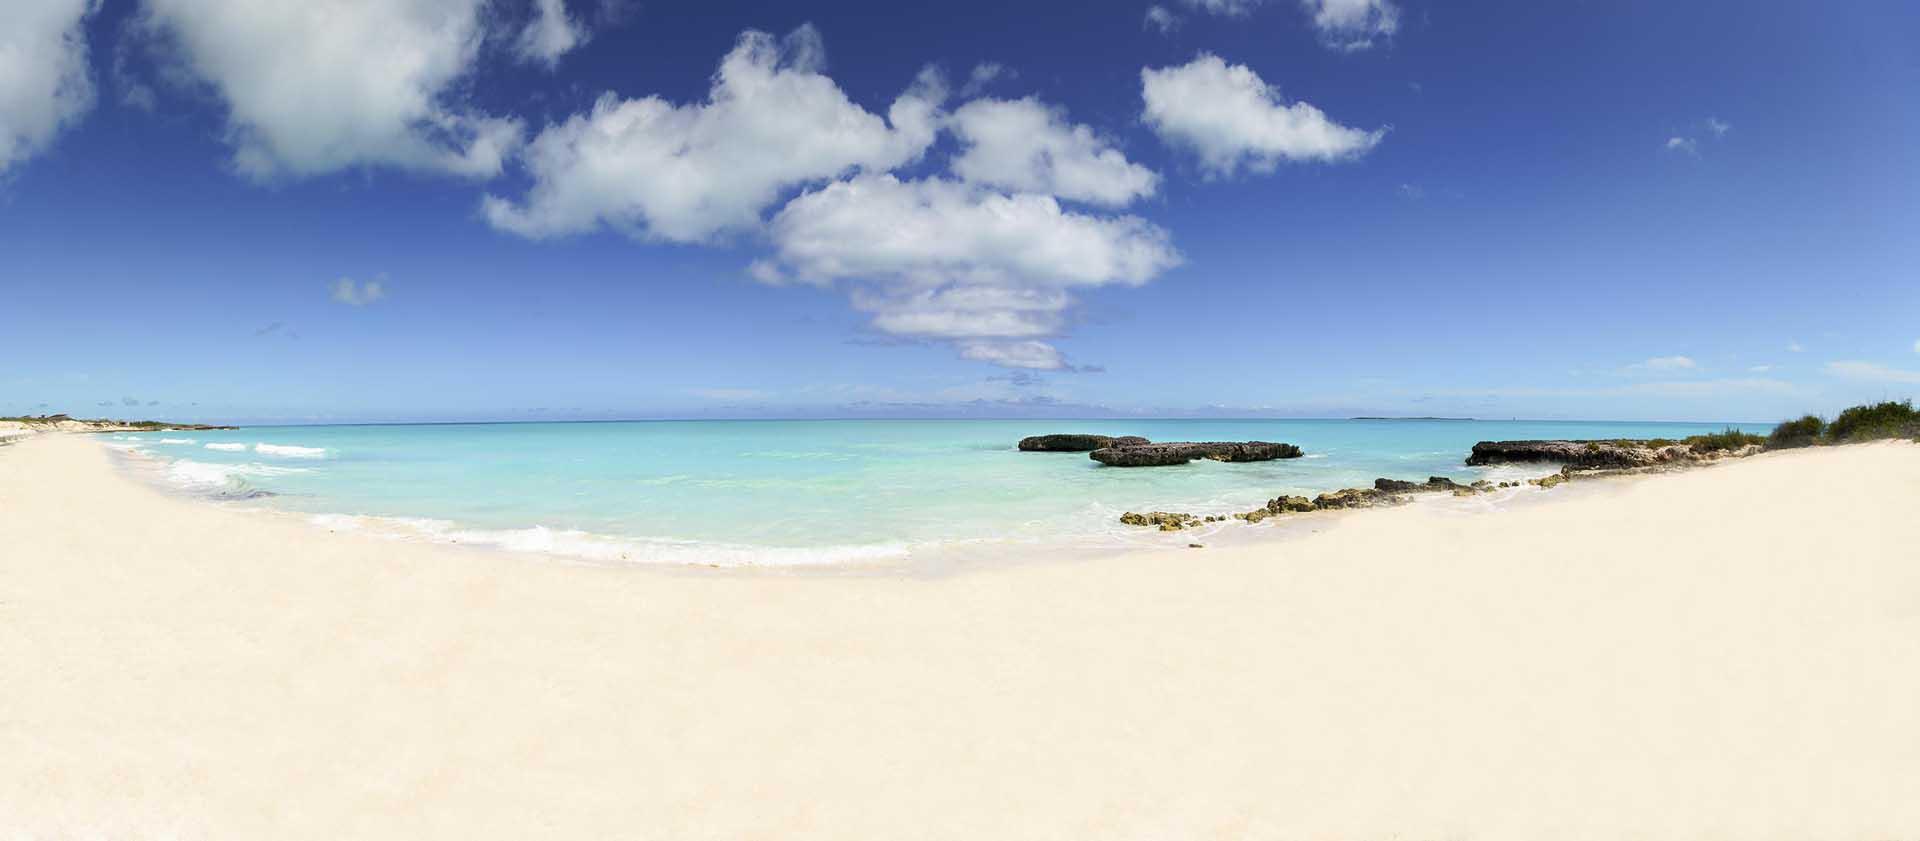 A0211 journee plage cayo santa maria 04 cuba autrement